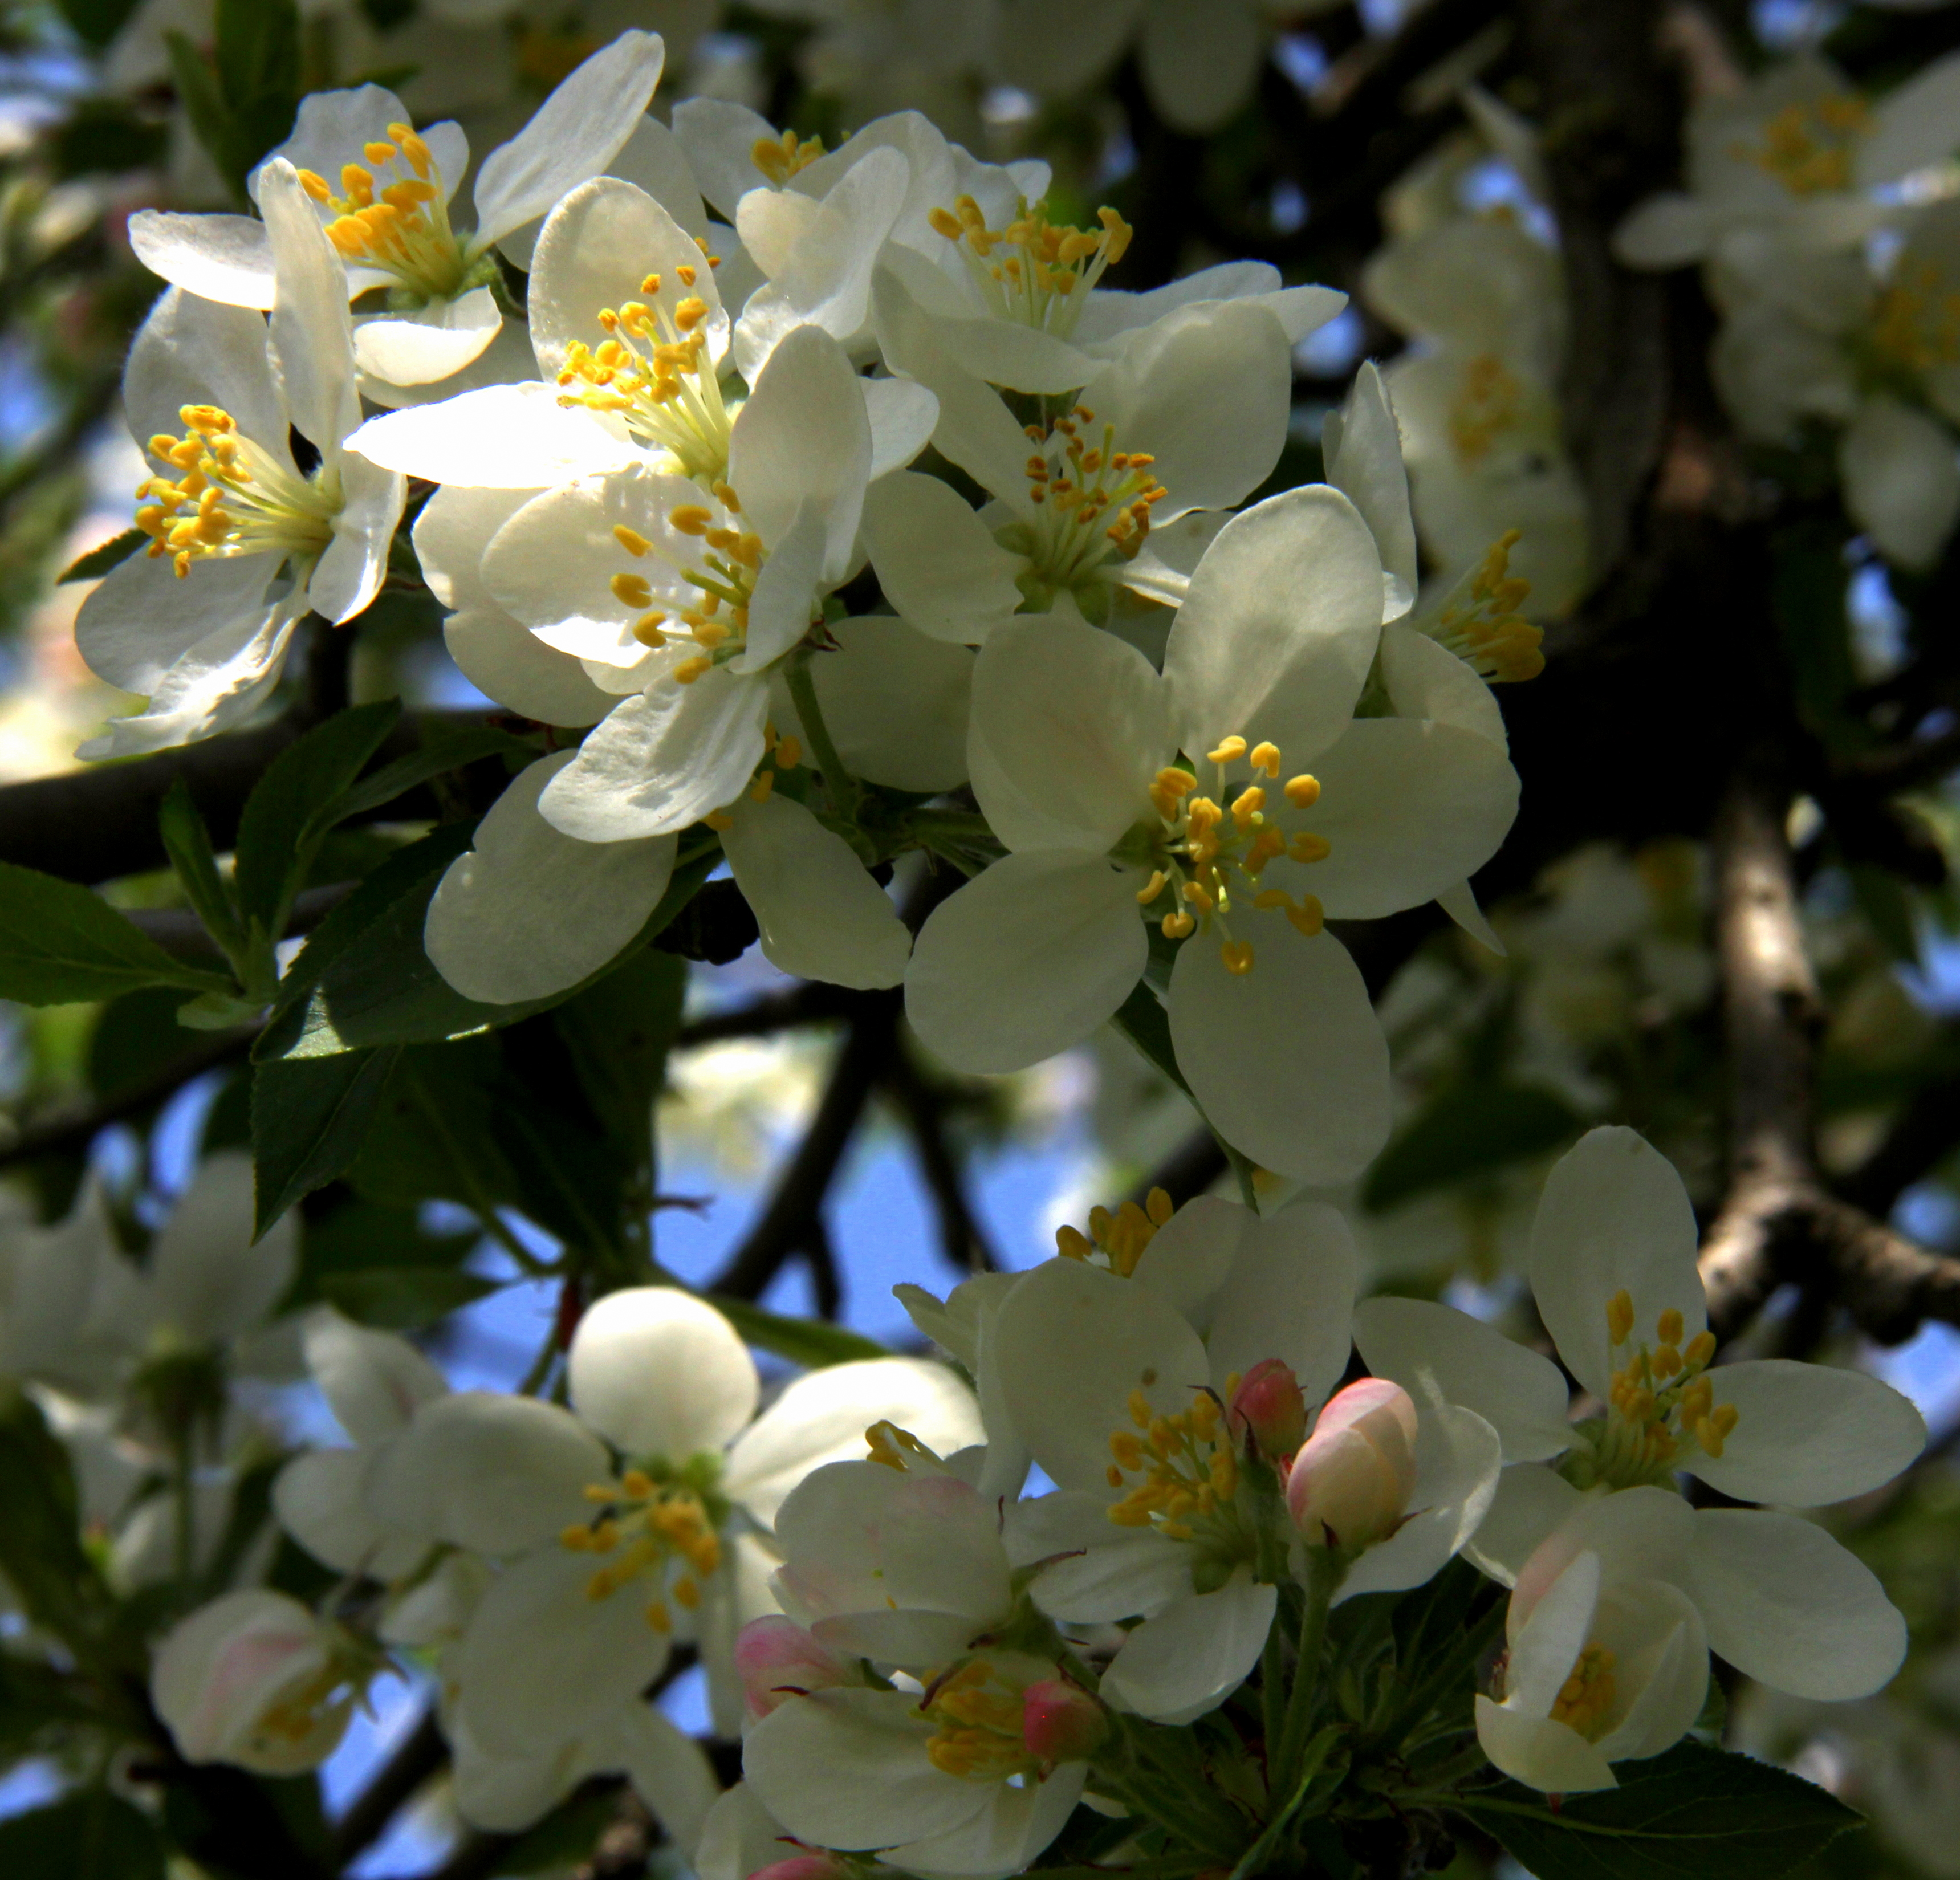 apple blossoms bloom in april in kashmir